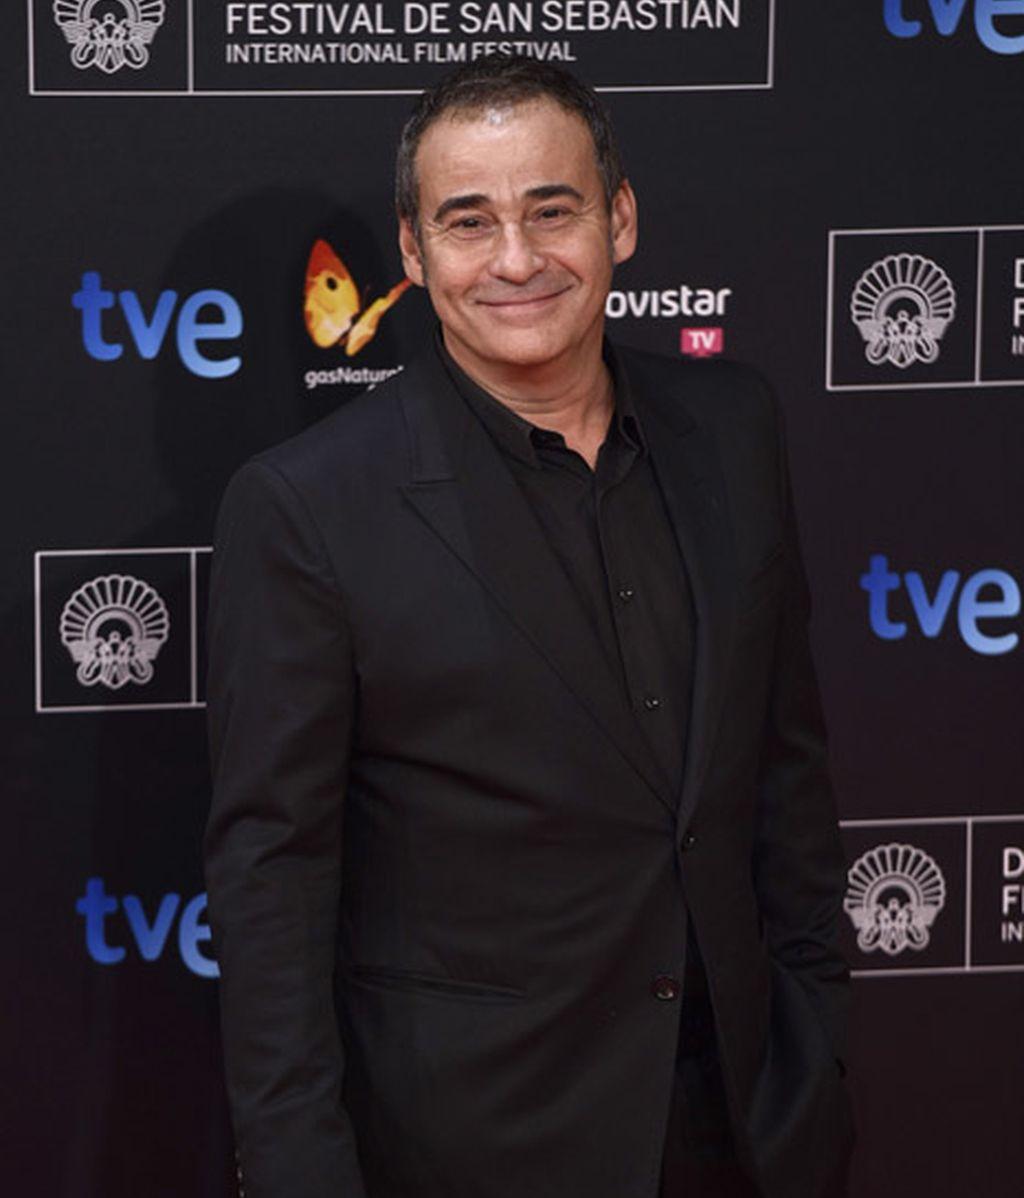 Eduard Fernández no se perdió la gala